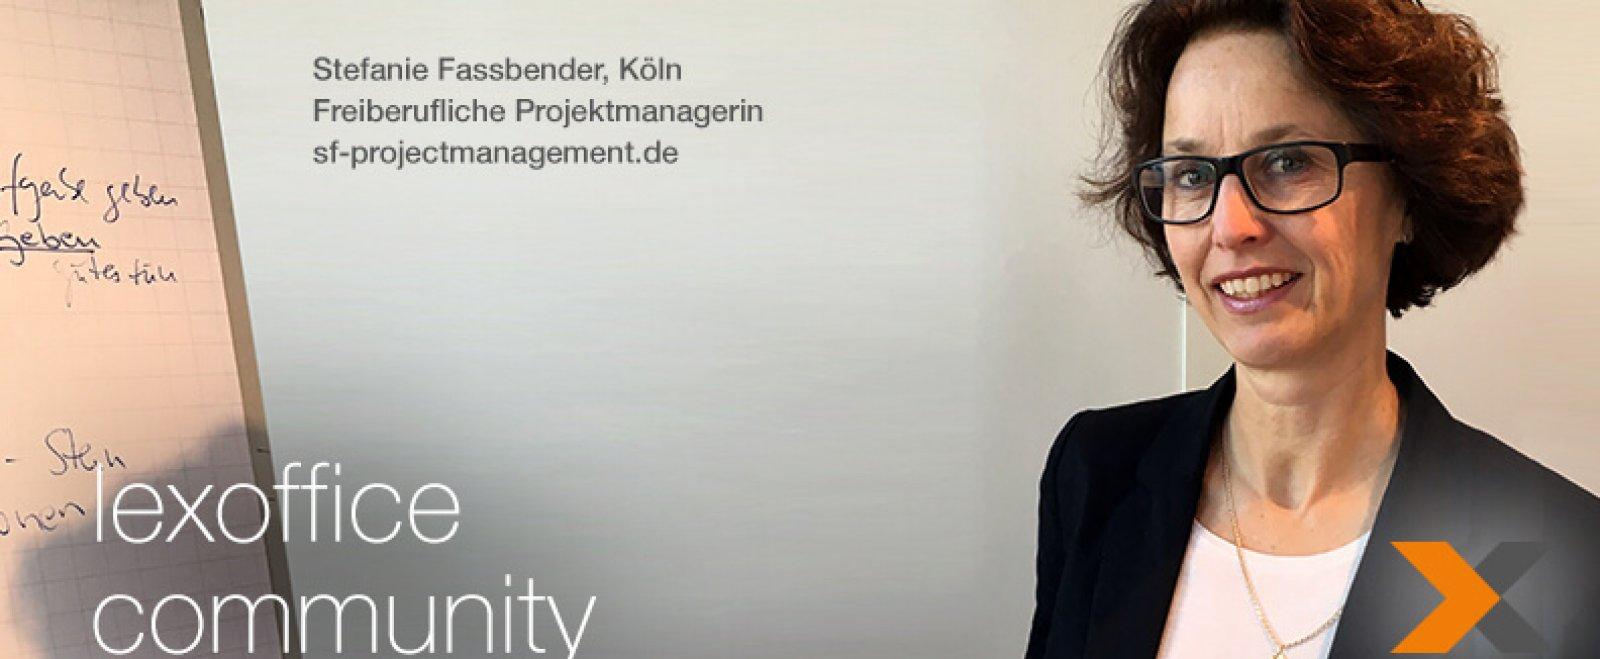 Freelance Projekt Manager Cologne lexoffice Community Interview 26 - Stefanie Fassbender, Köln